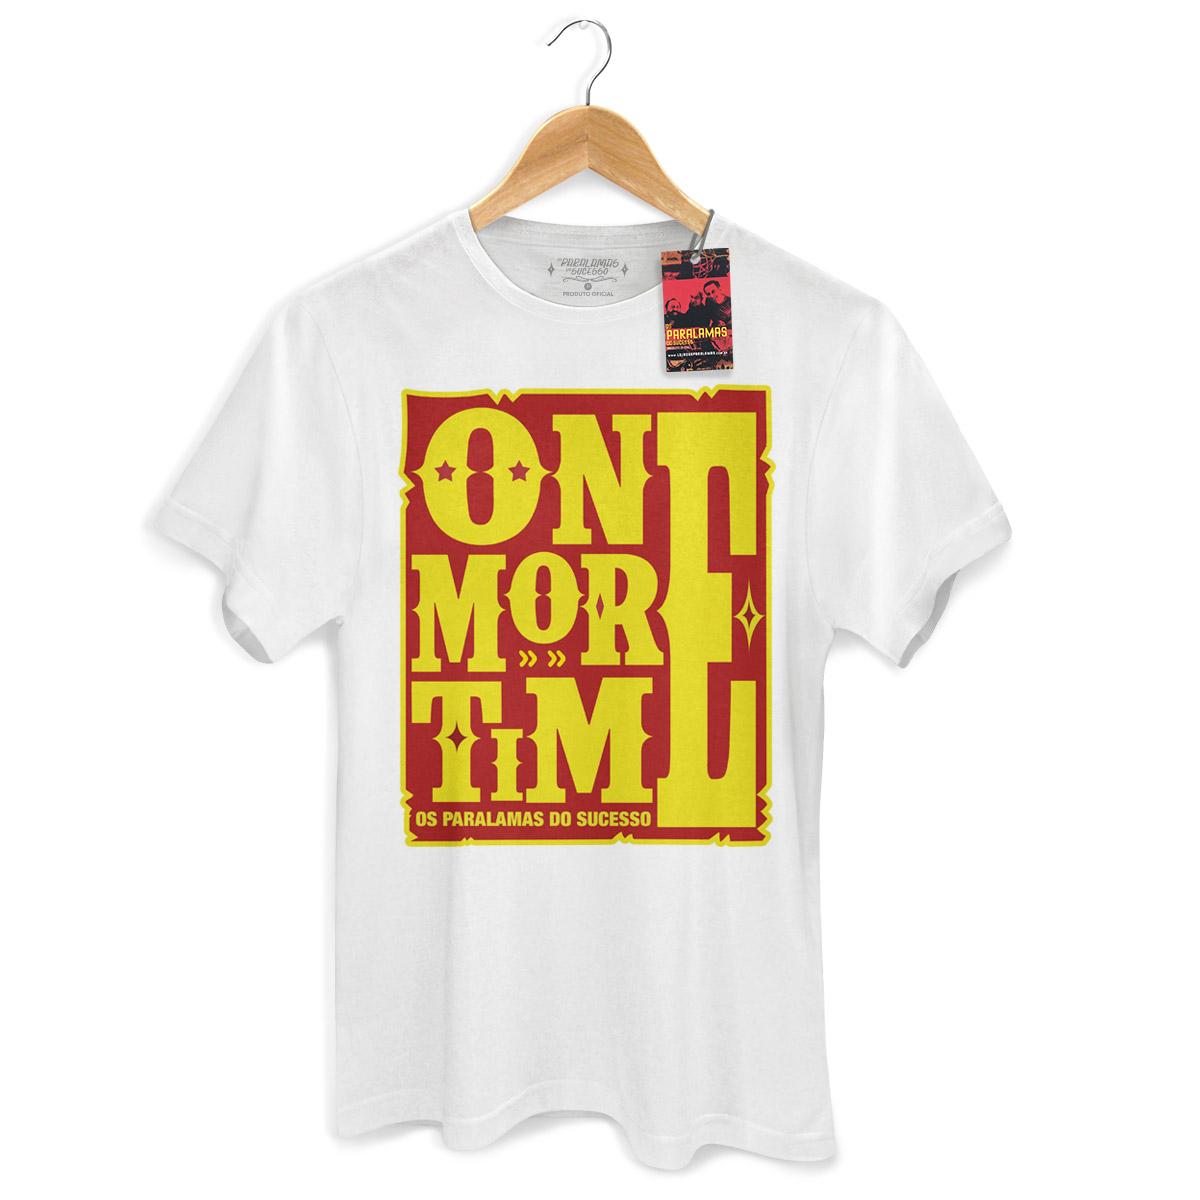 Camiseta Masculina Os Paralamas Do Sucesso One More Time